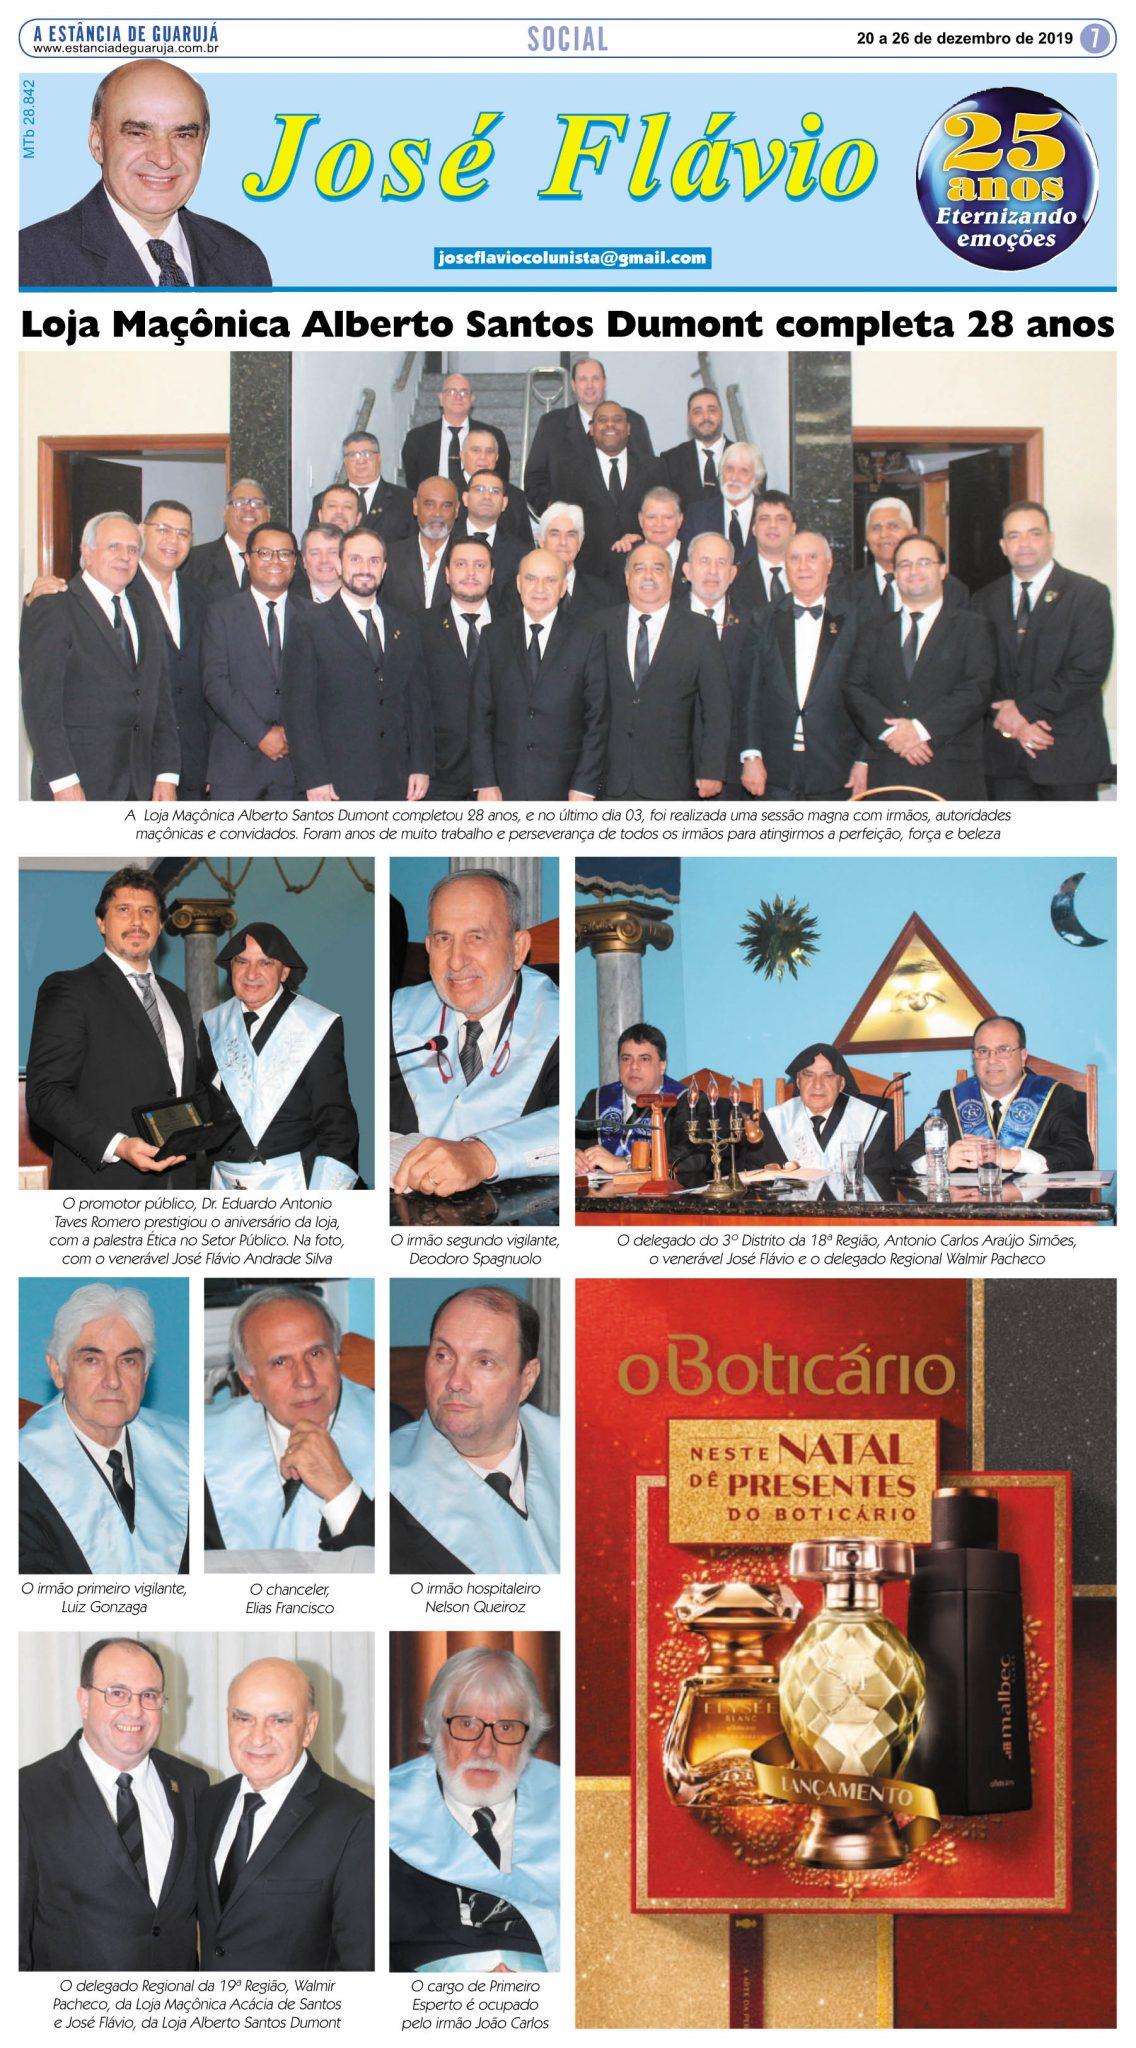 Loja Maçônica Alberto Santos Dumont completa 28 anos